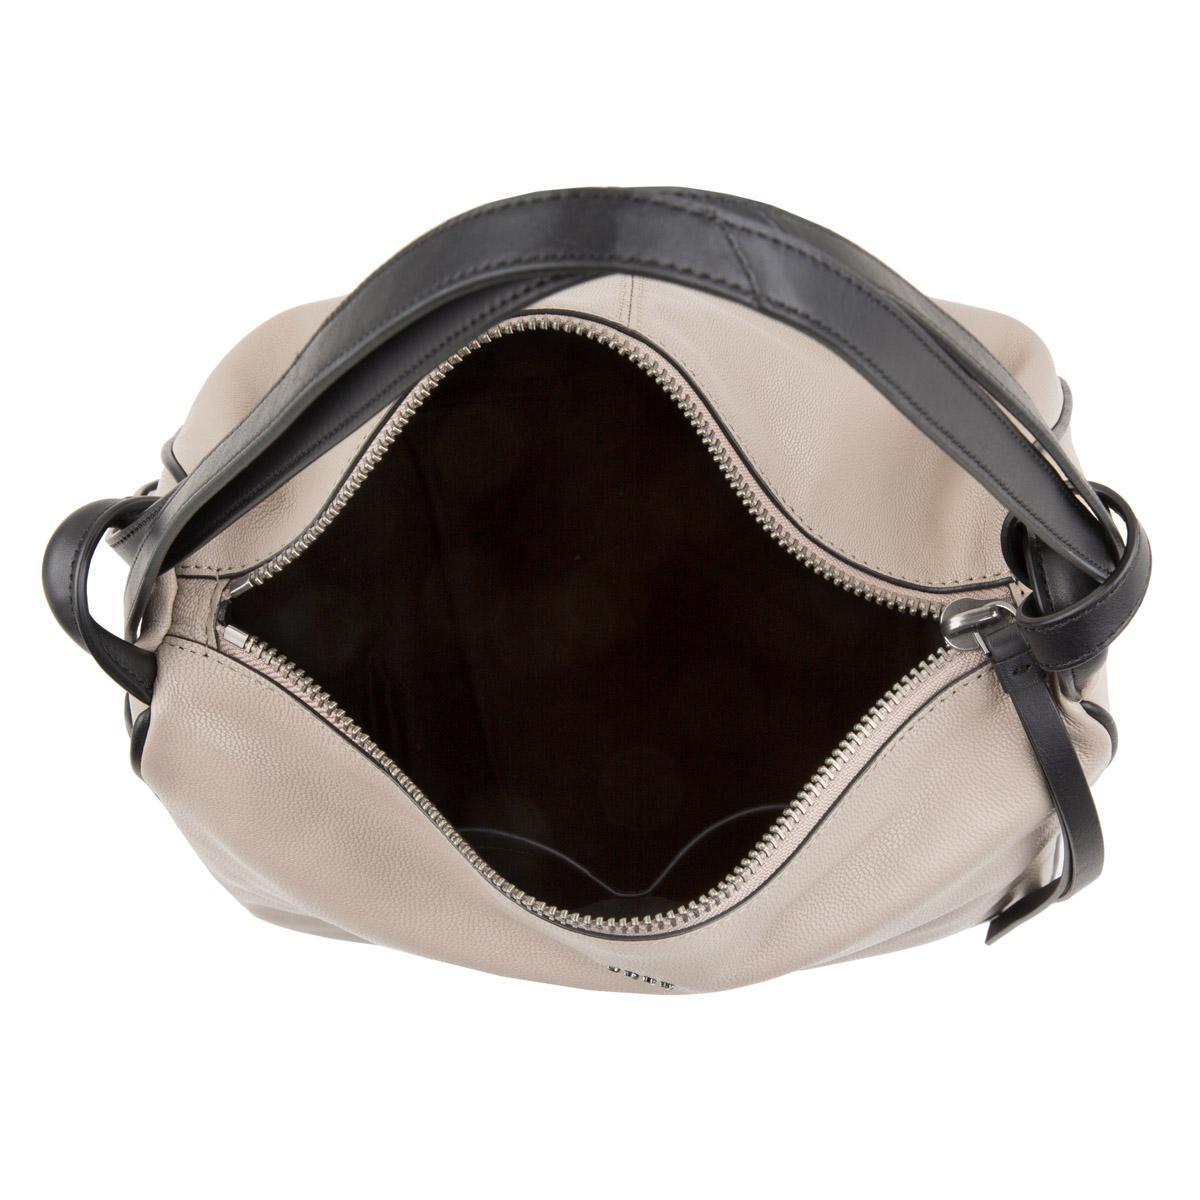 Dkny Hybrid Slouch Medium Hobo Soft Clay-black in White - Lyst bef386f598814